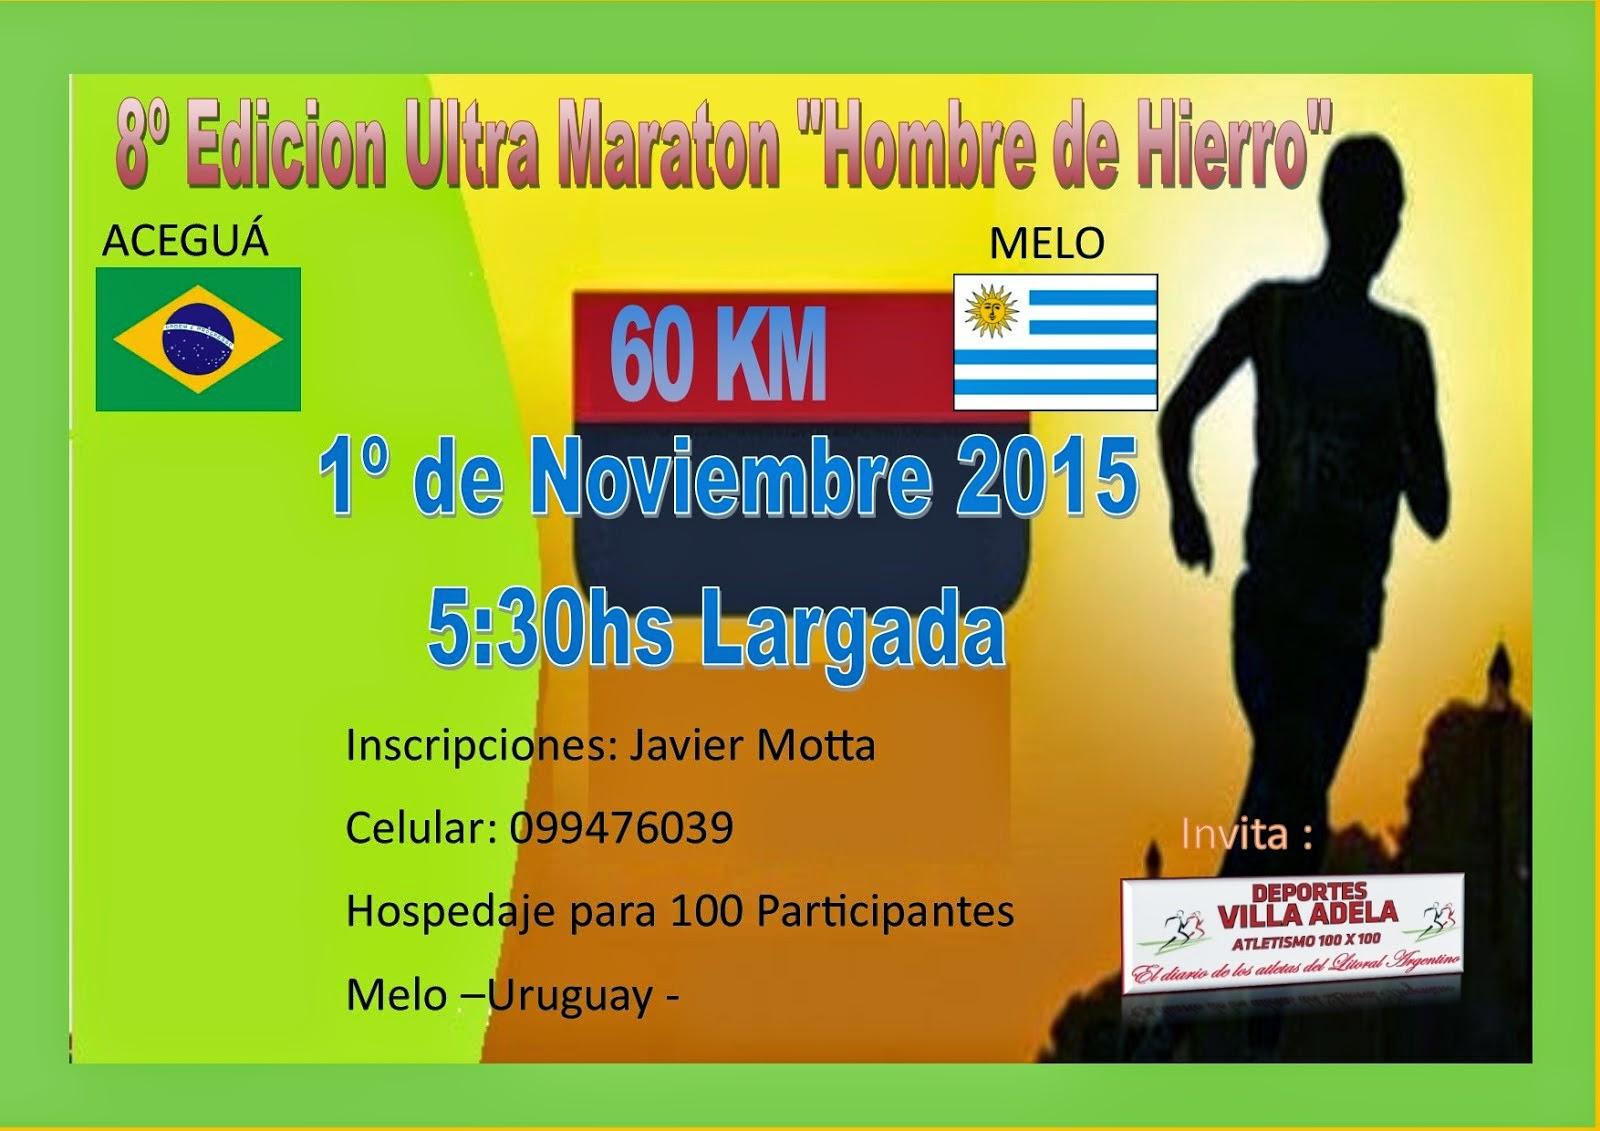 Ultra Maraton Acegua -Melo (Brasil -Uruguay)